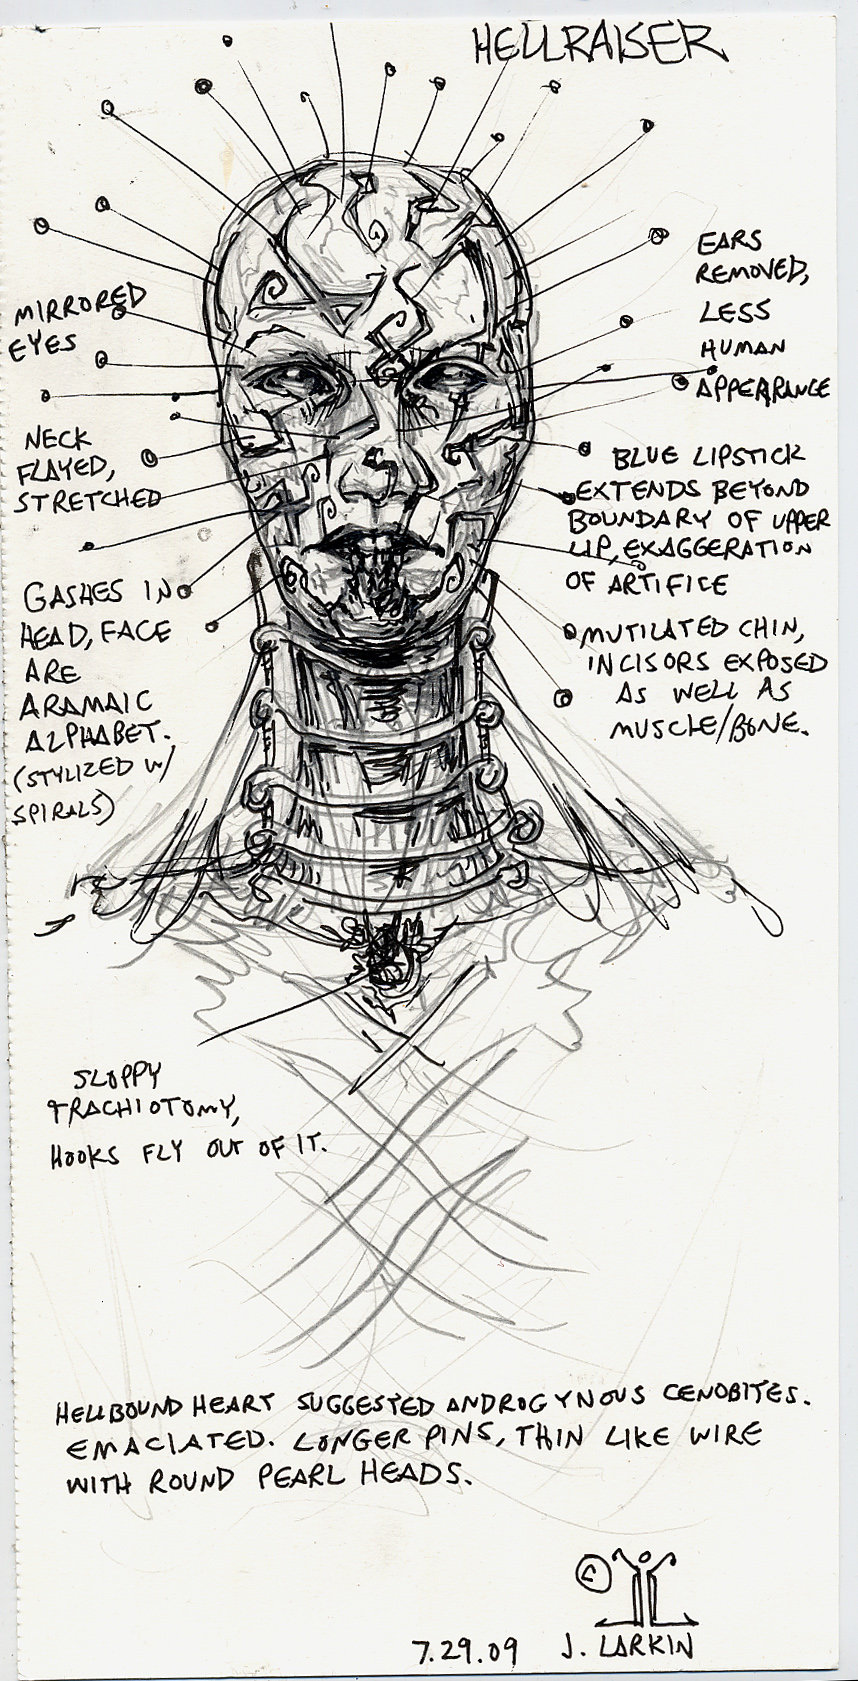 Drawn pinhead white Larkin DeviantArt redesign Hellraiser art